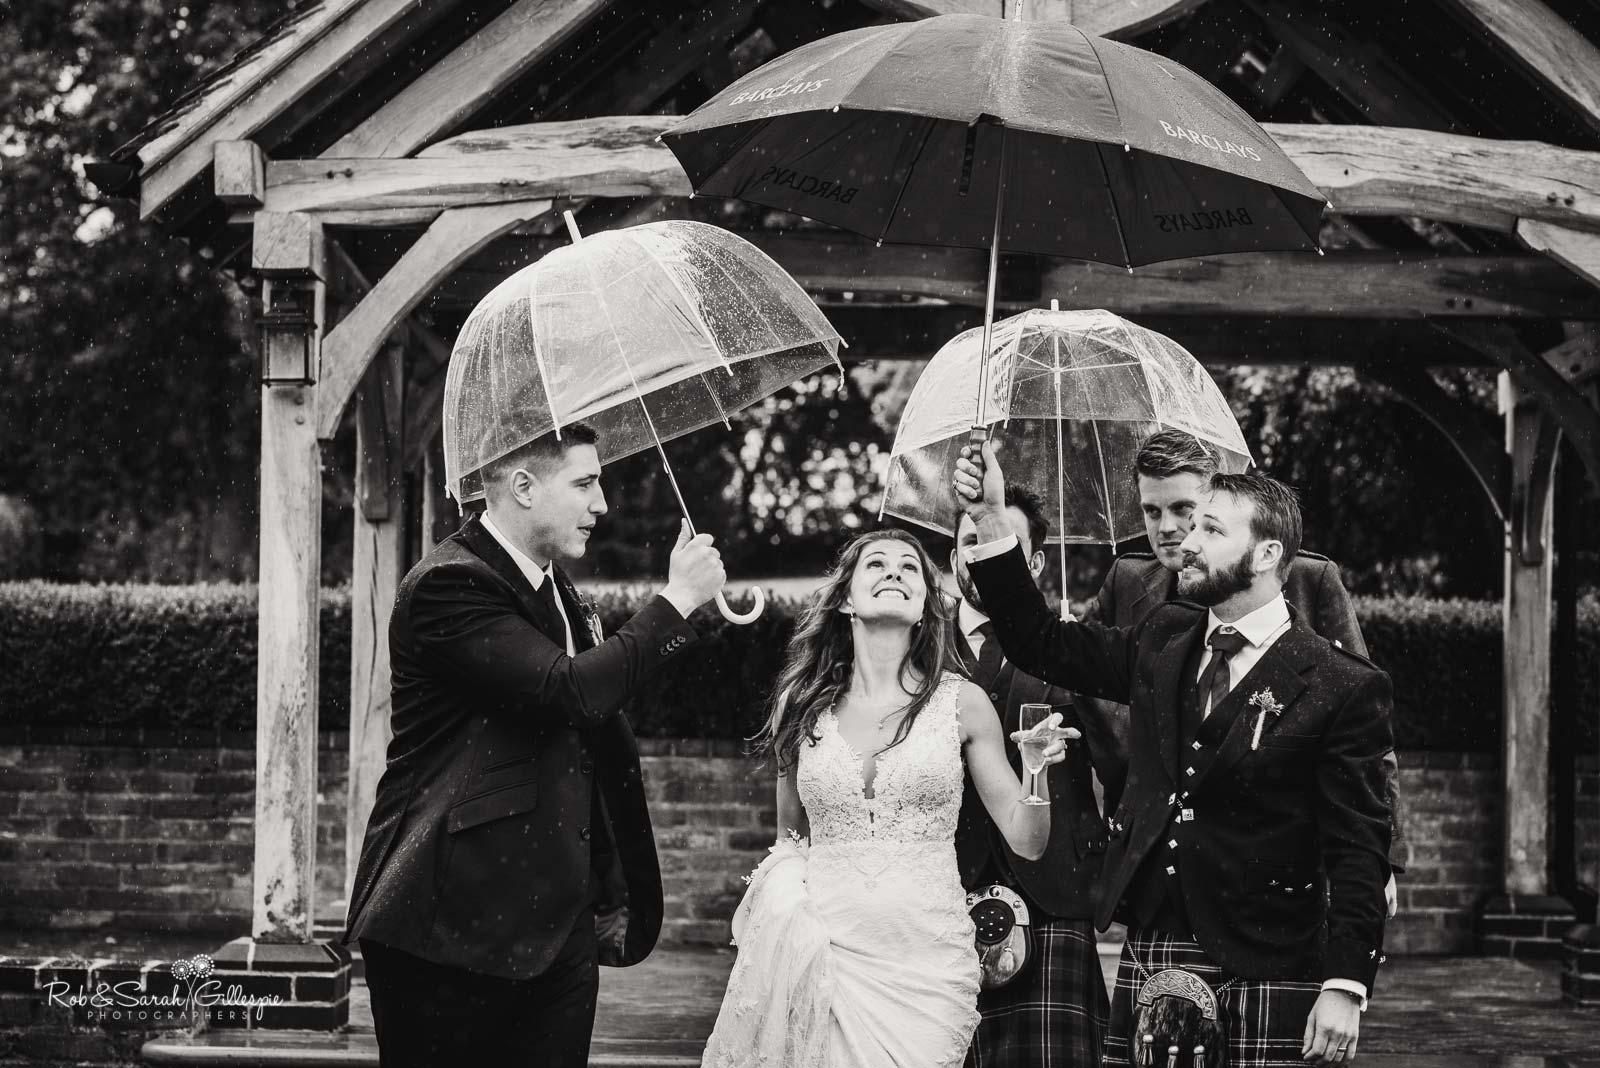 Bride under umblrellas at Wethele Manor